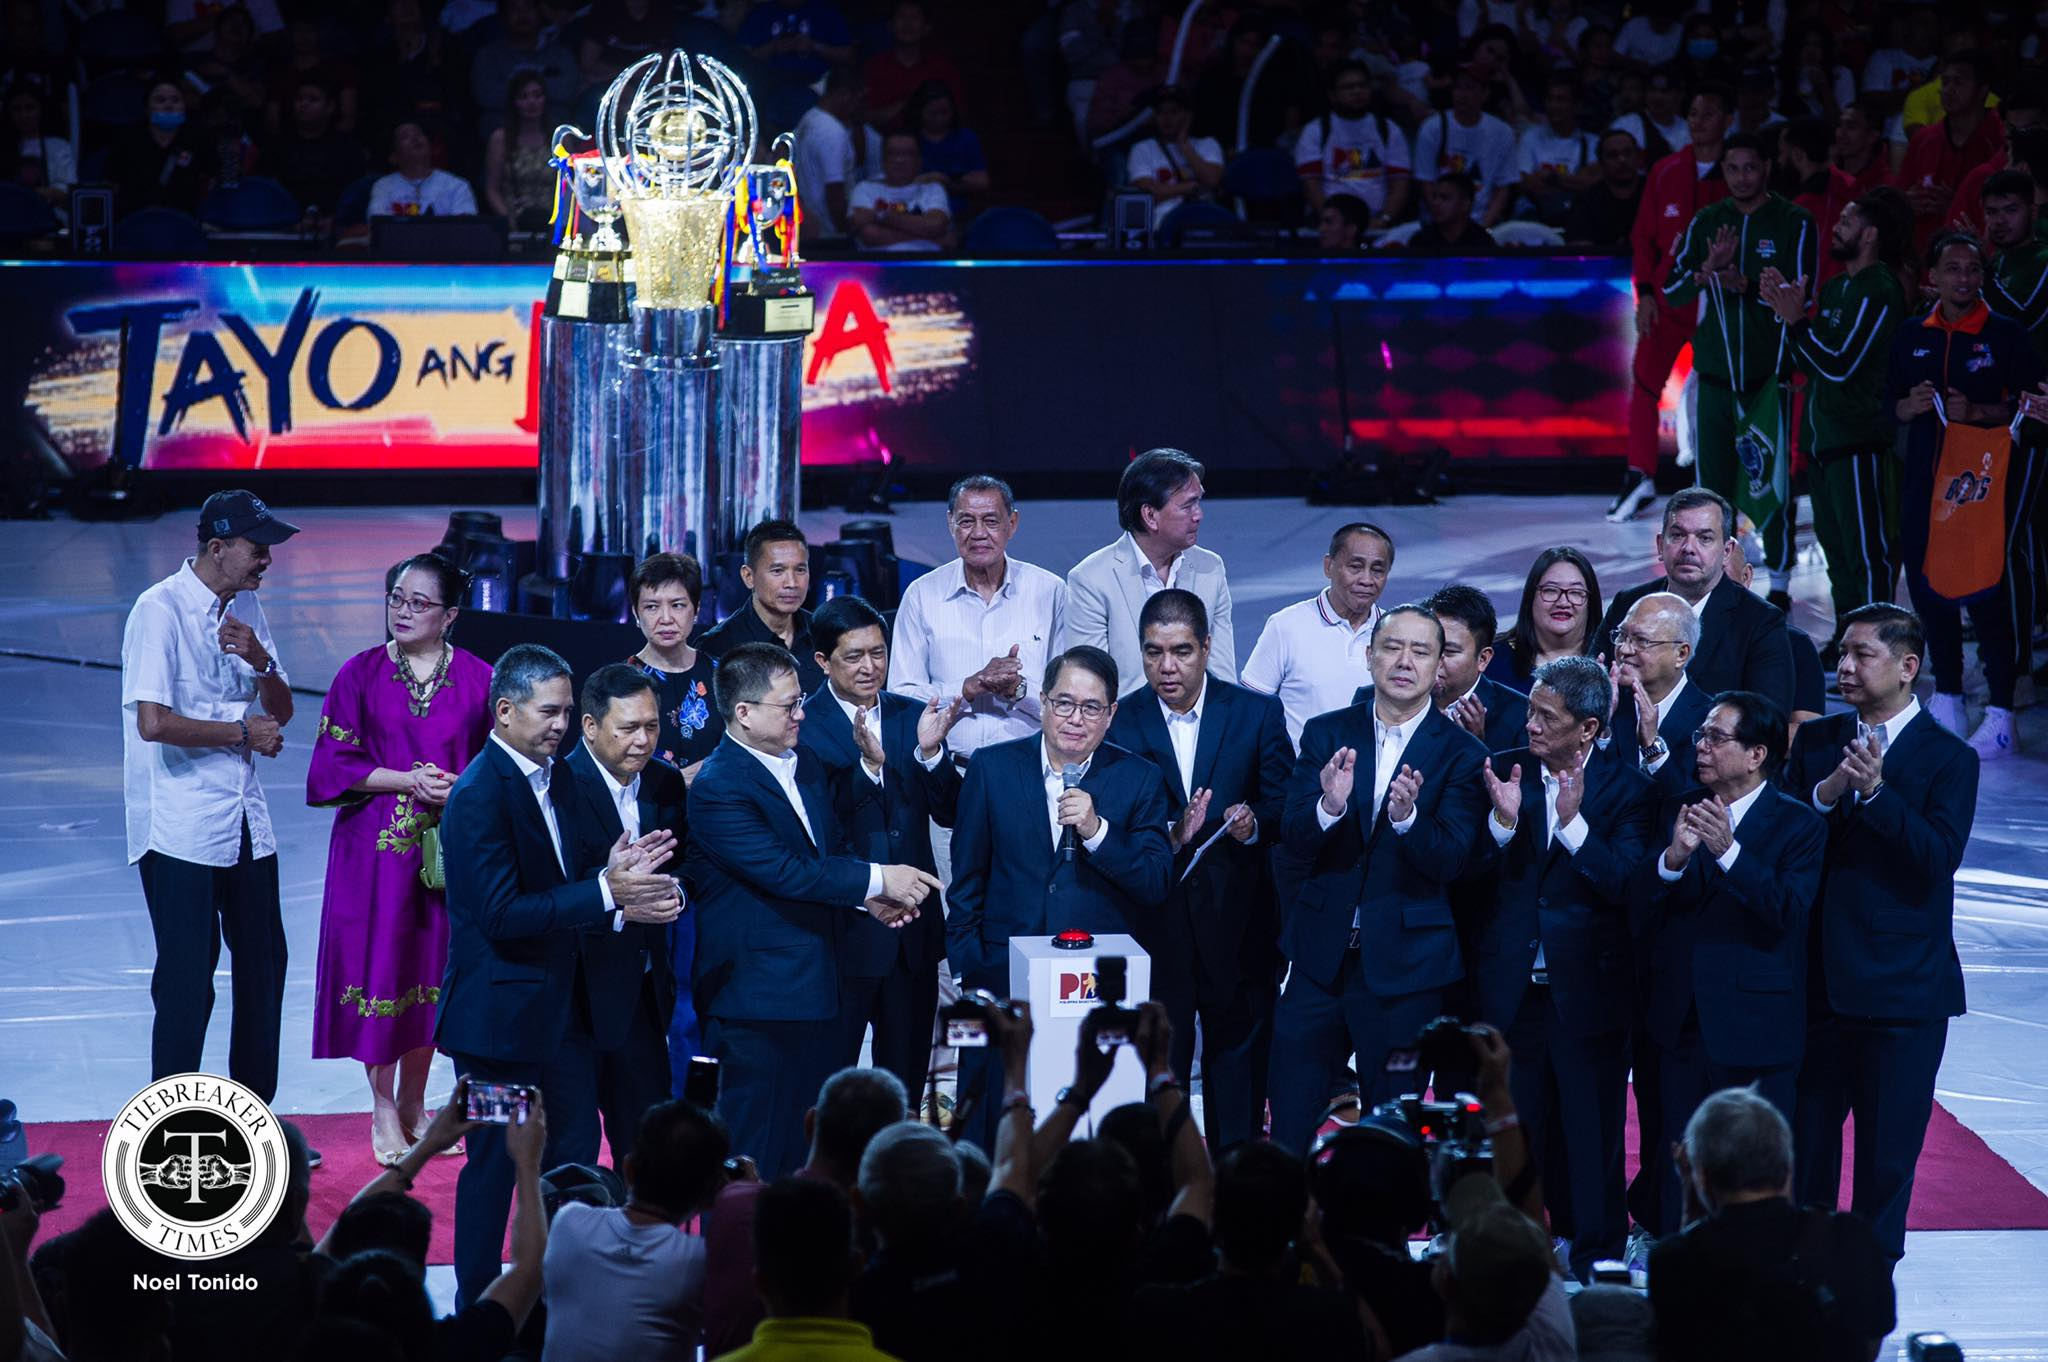 Tiebreaker Times PBA suspends games due to coronavirus crisis Basketball News PBA PBA 3X3 PBA D-League  PBA Season 45 Coronavirus Pandemic 2020 PBA Philippine Cup 2020 PBA D-League Season 2020 PBA D-League Aspirants Cup 2020 PBA 3x3 Philippine Cup